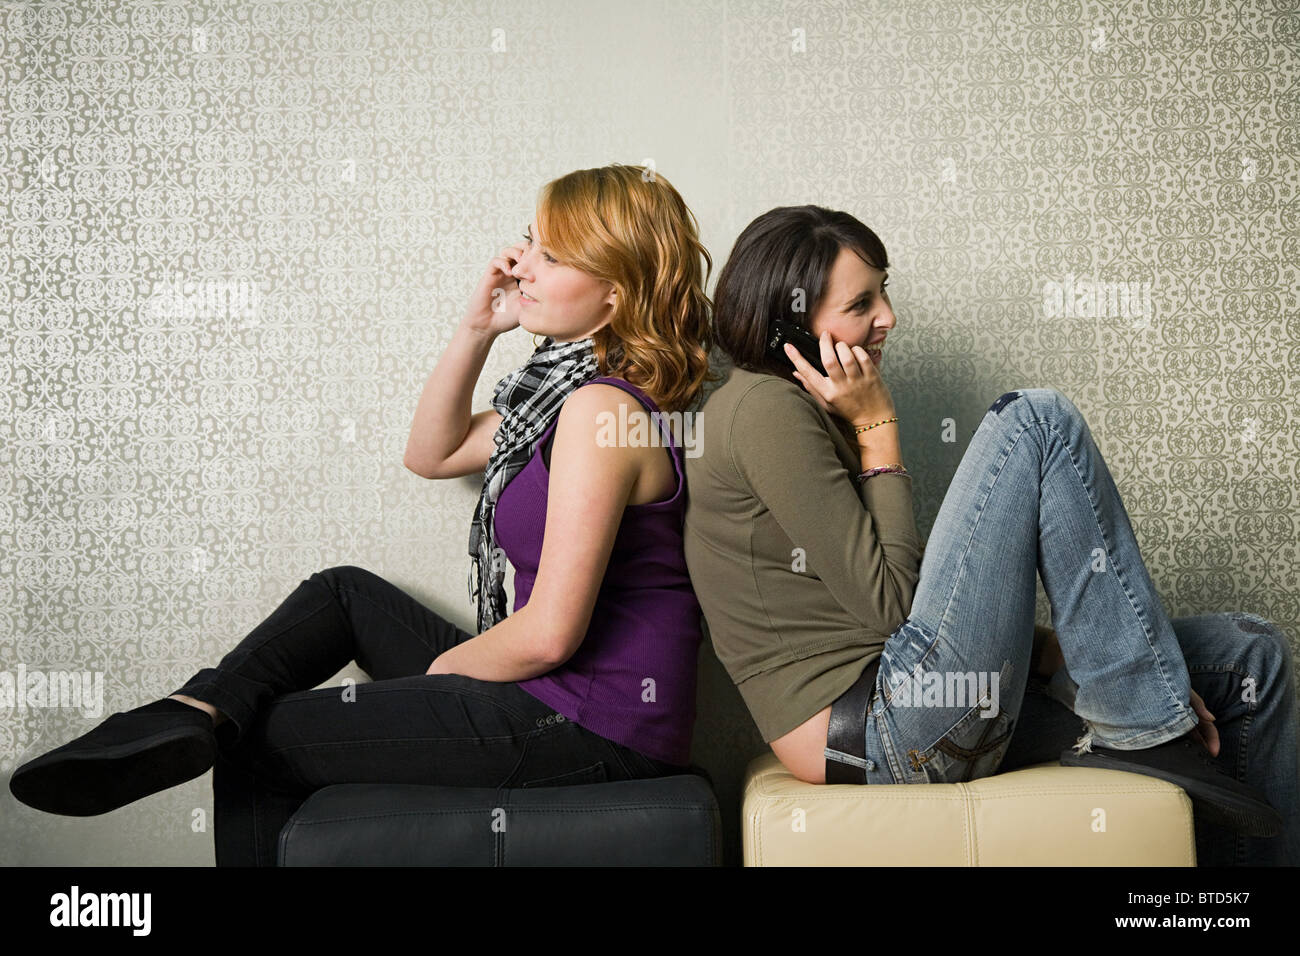 Mädchen im Teenageralter mit smartphones Stockfotografie